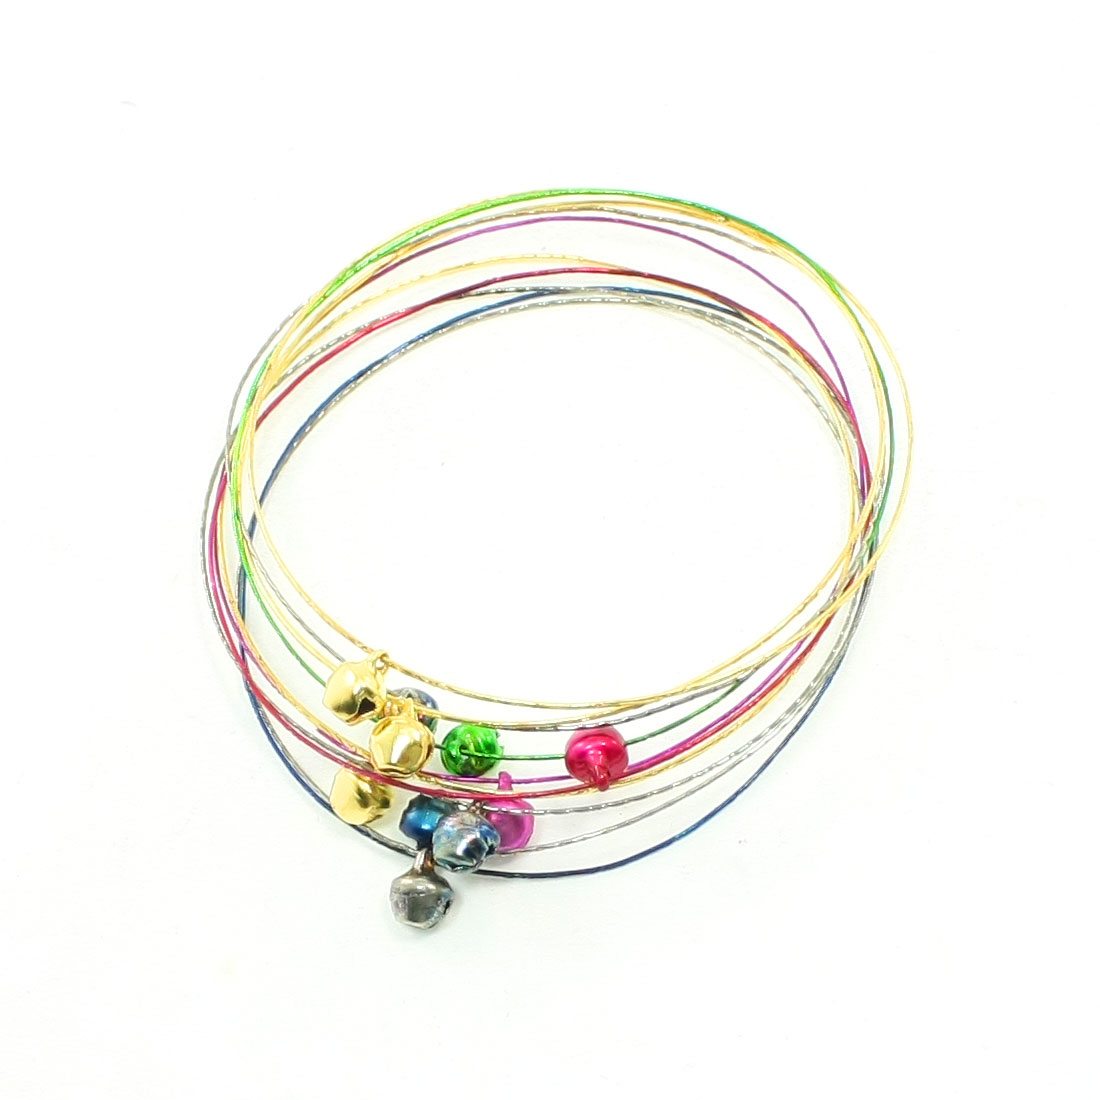 Ladies Assorted Color Multi Layer Wrist Ring Bracelet Bangle 10 Pcs